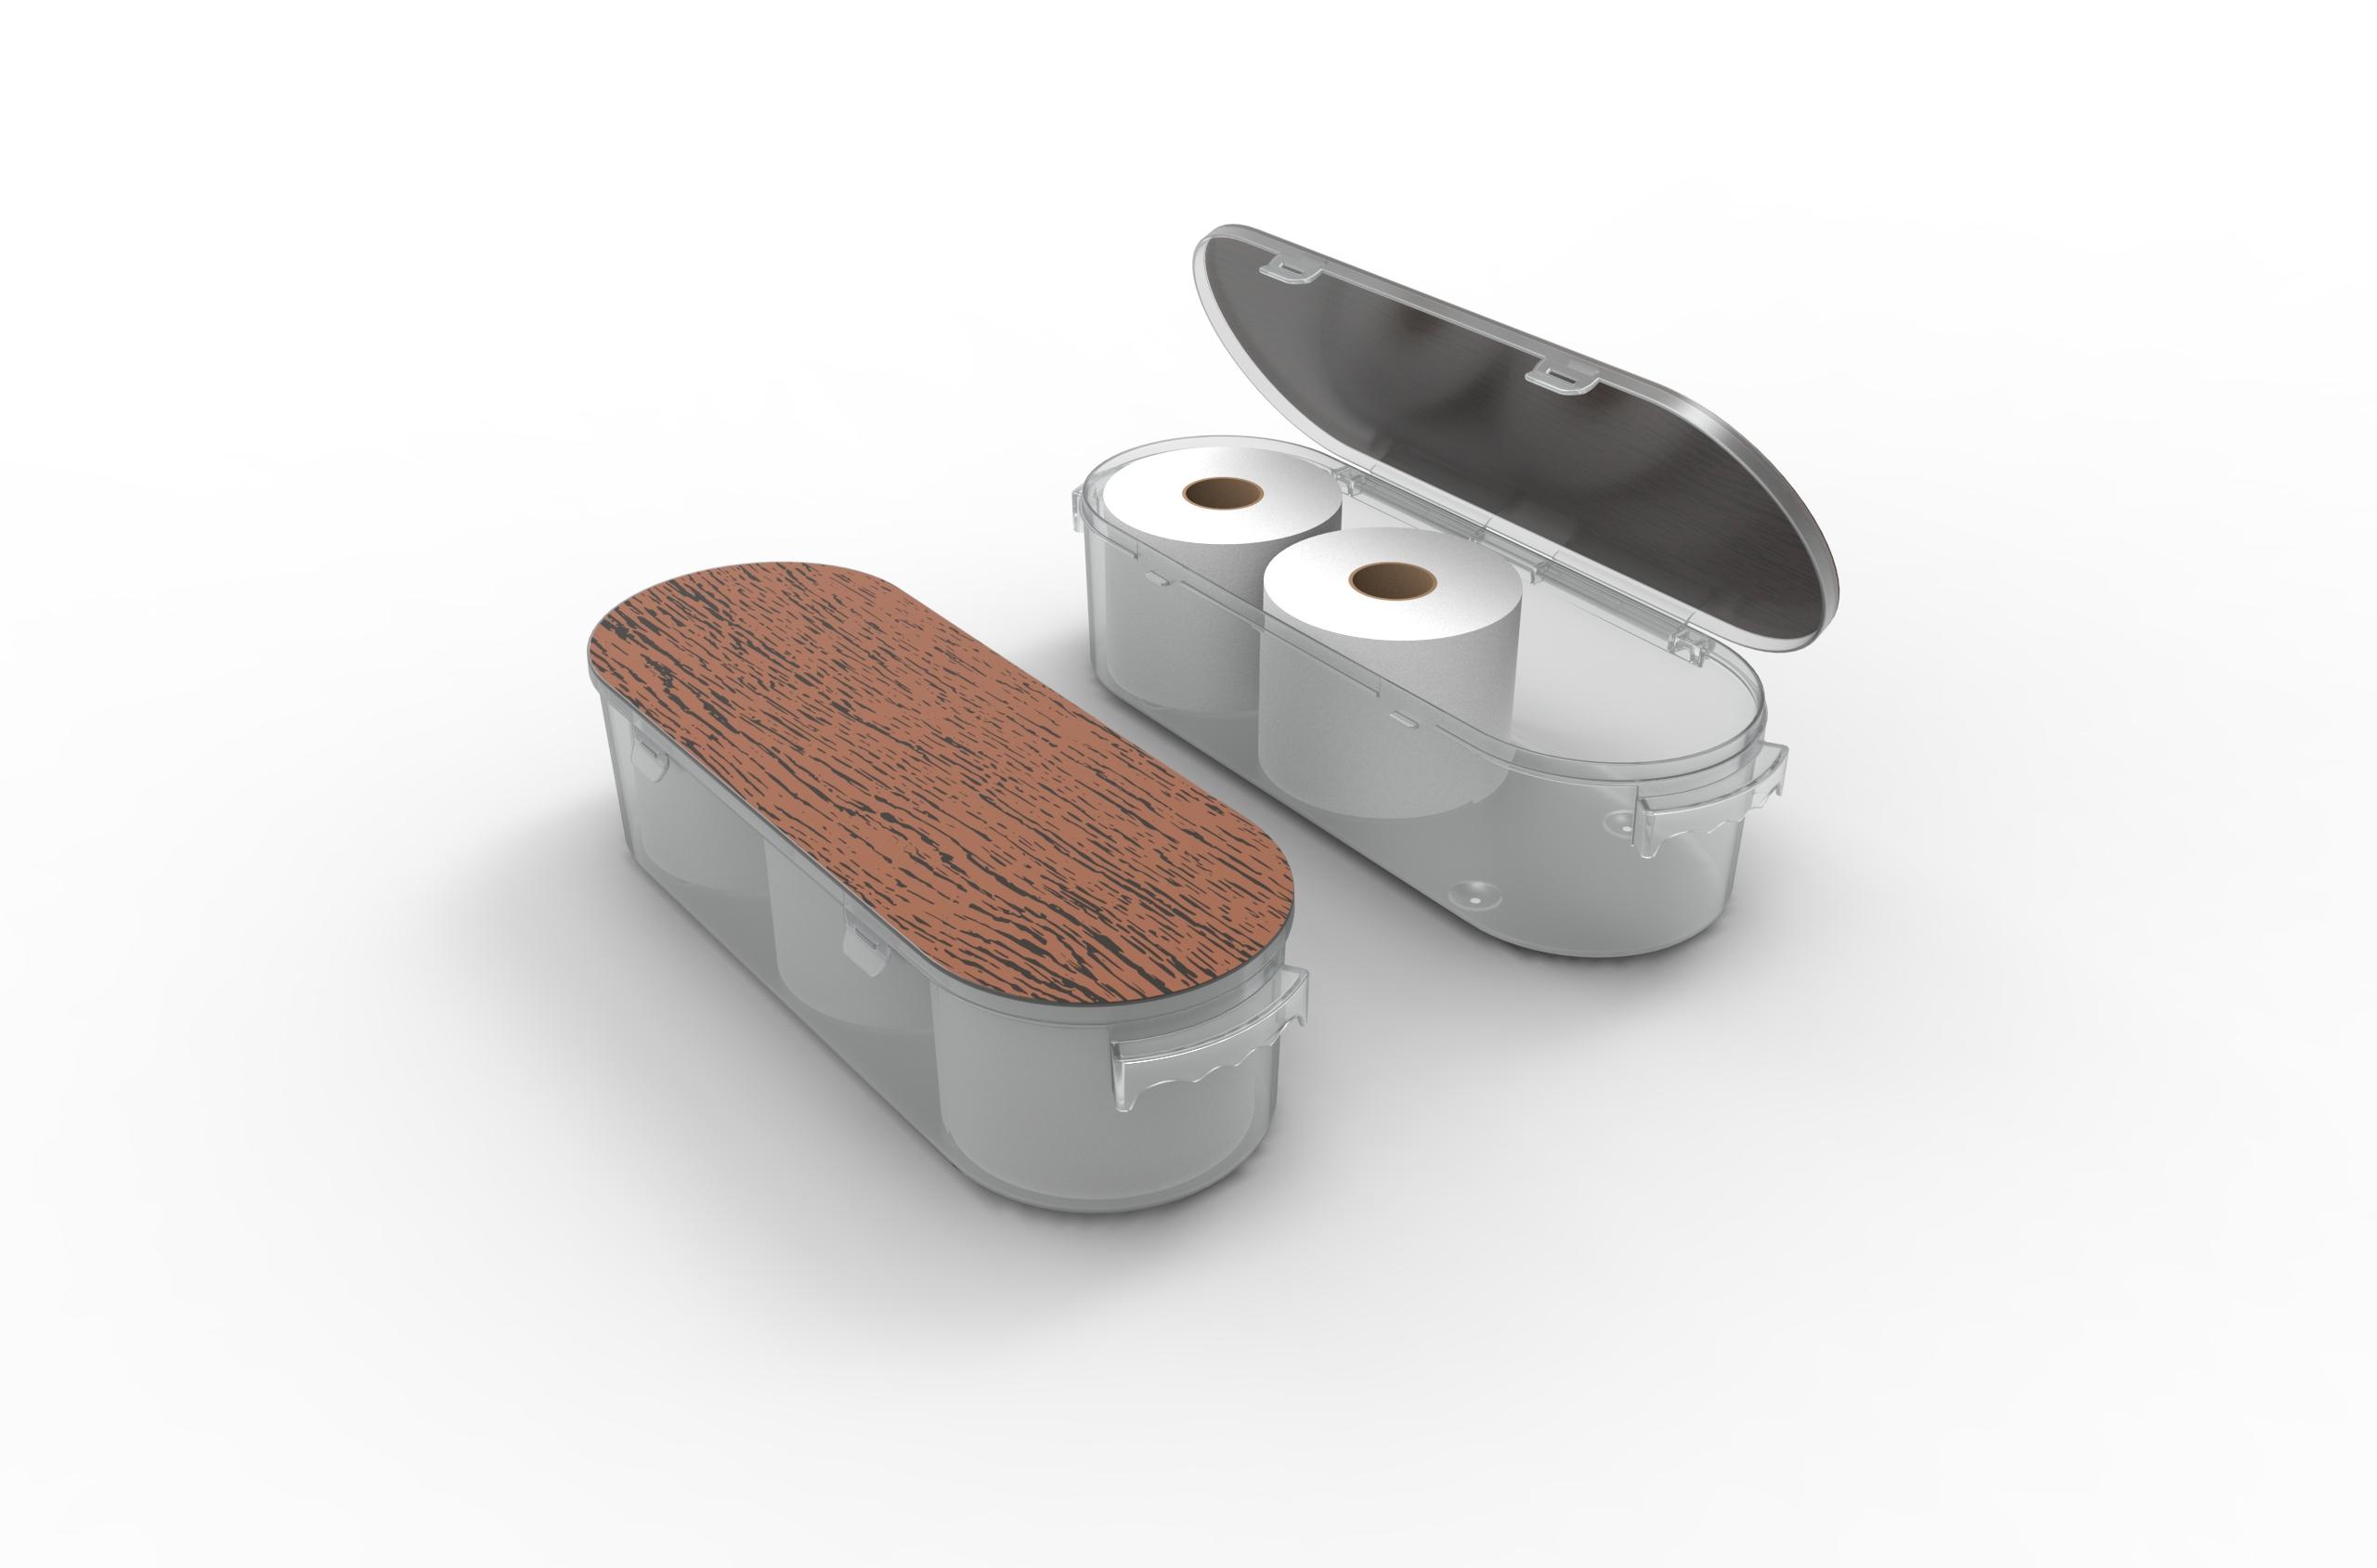 Nykia Designs Bathroom Toilet Paper Storage Solution - Wood